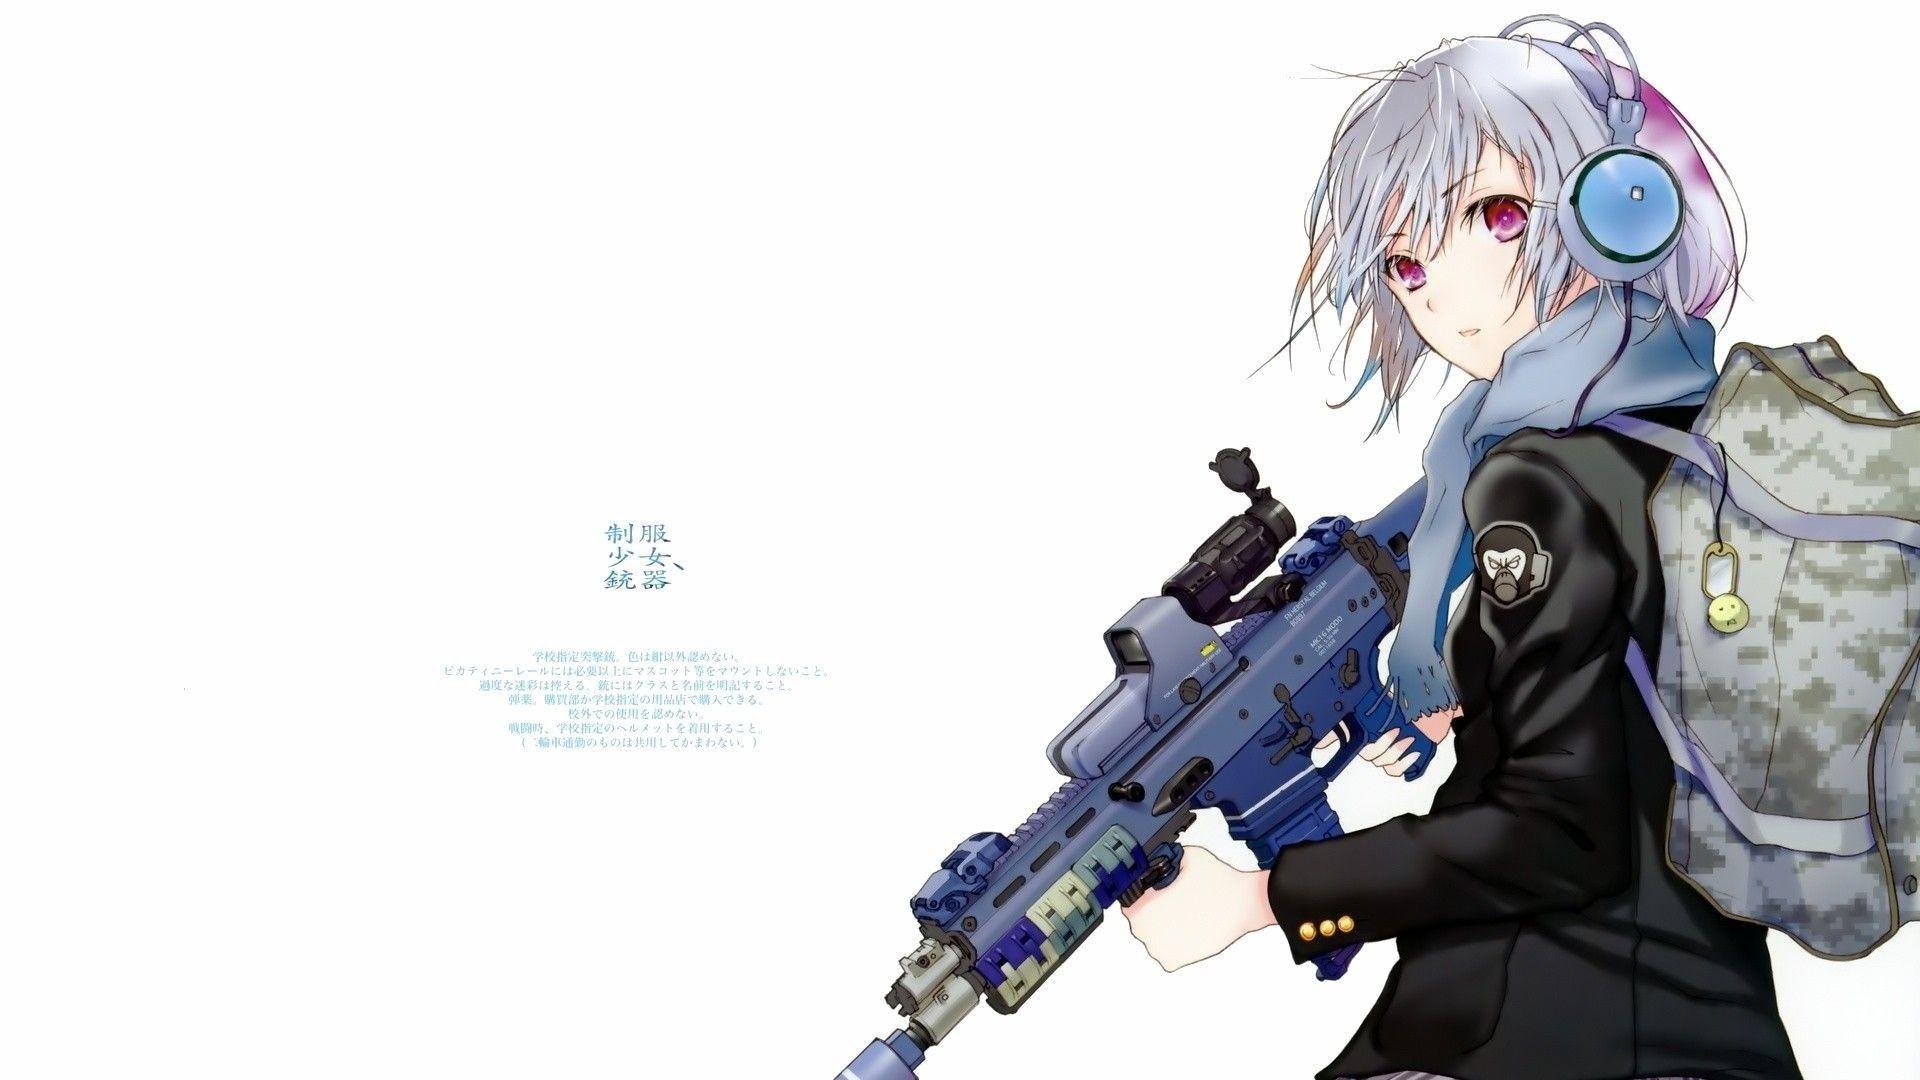 Image Result For Anime Manga Wallpaper Iphonea